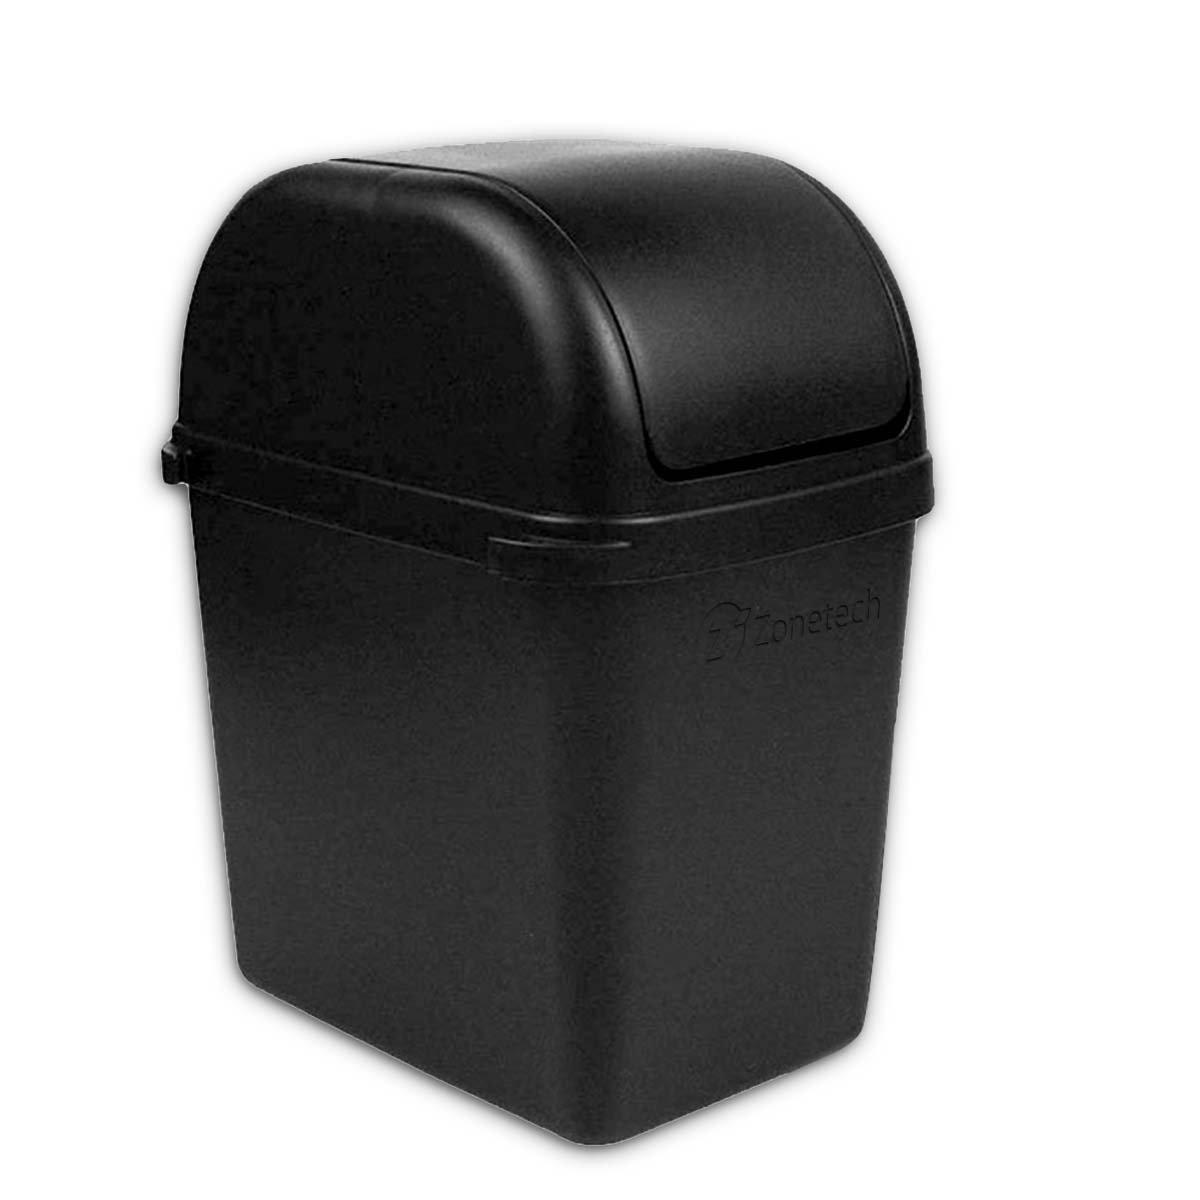 Zone Tech Portable Small Car Garbage Trash Litter Wastebasket Can Latc